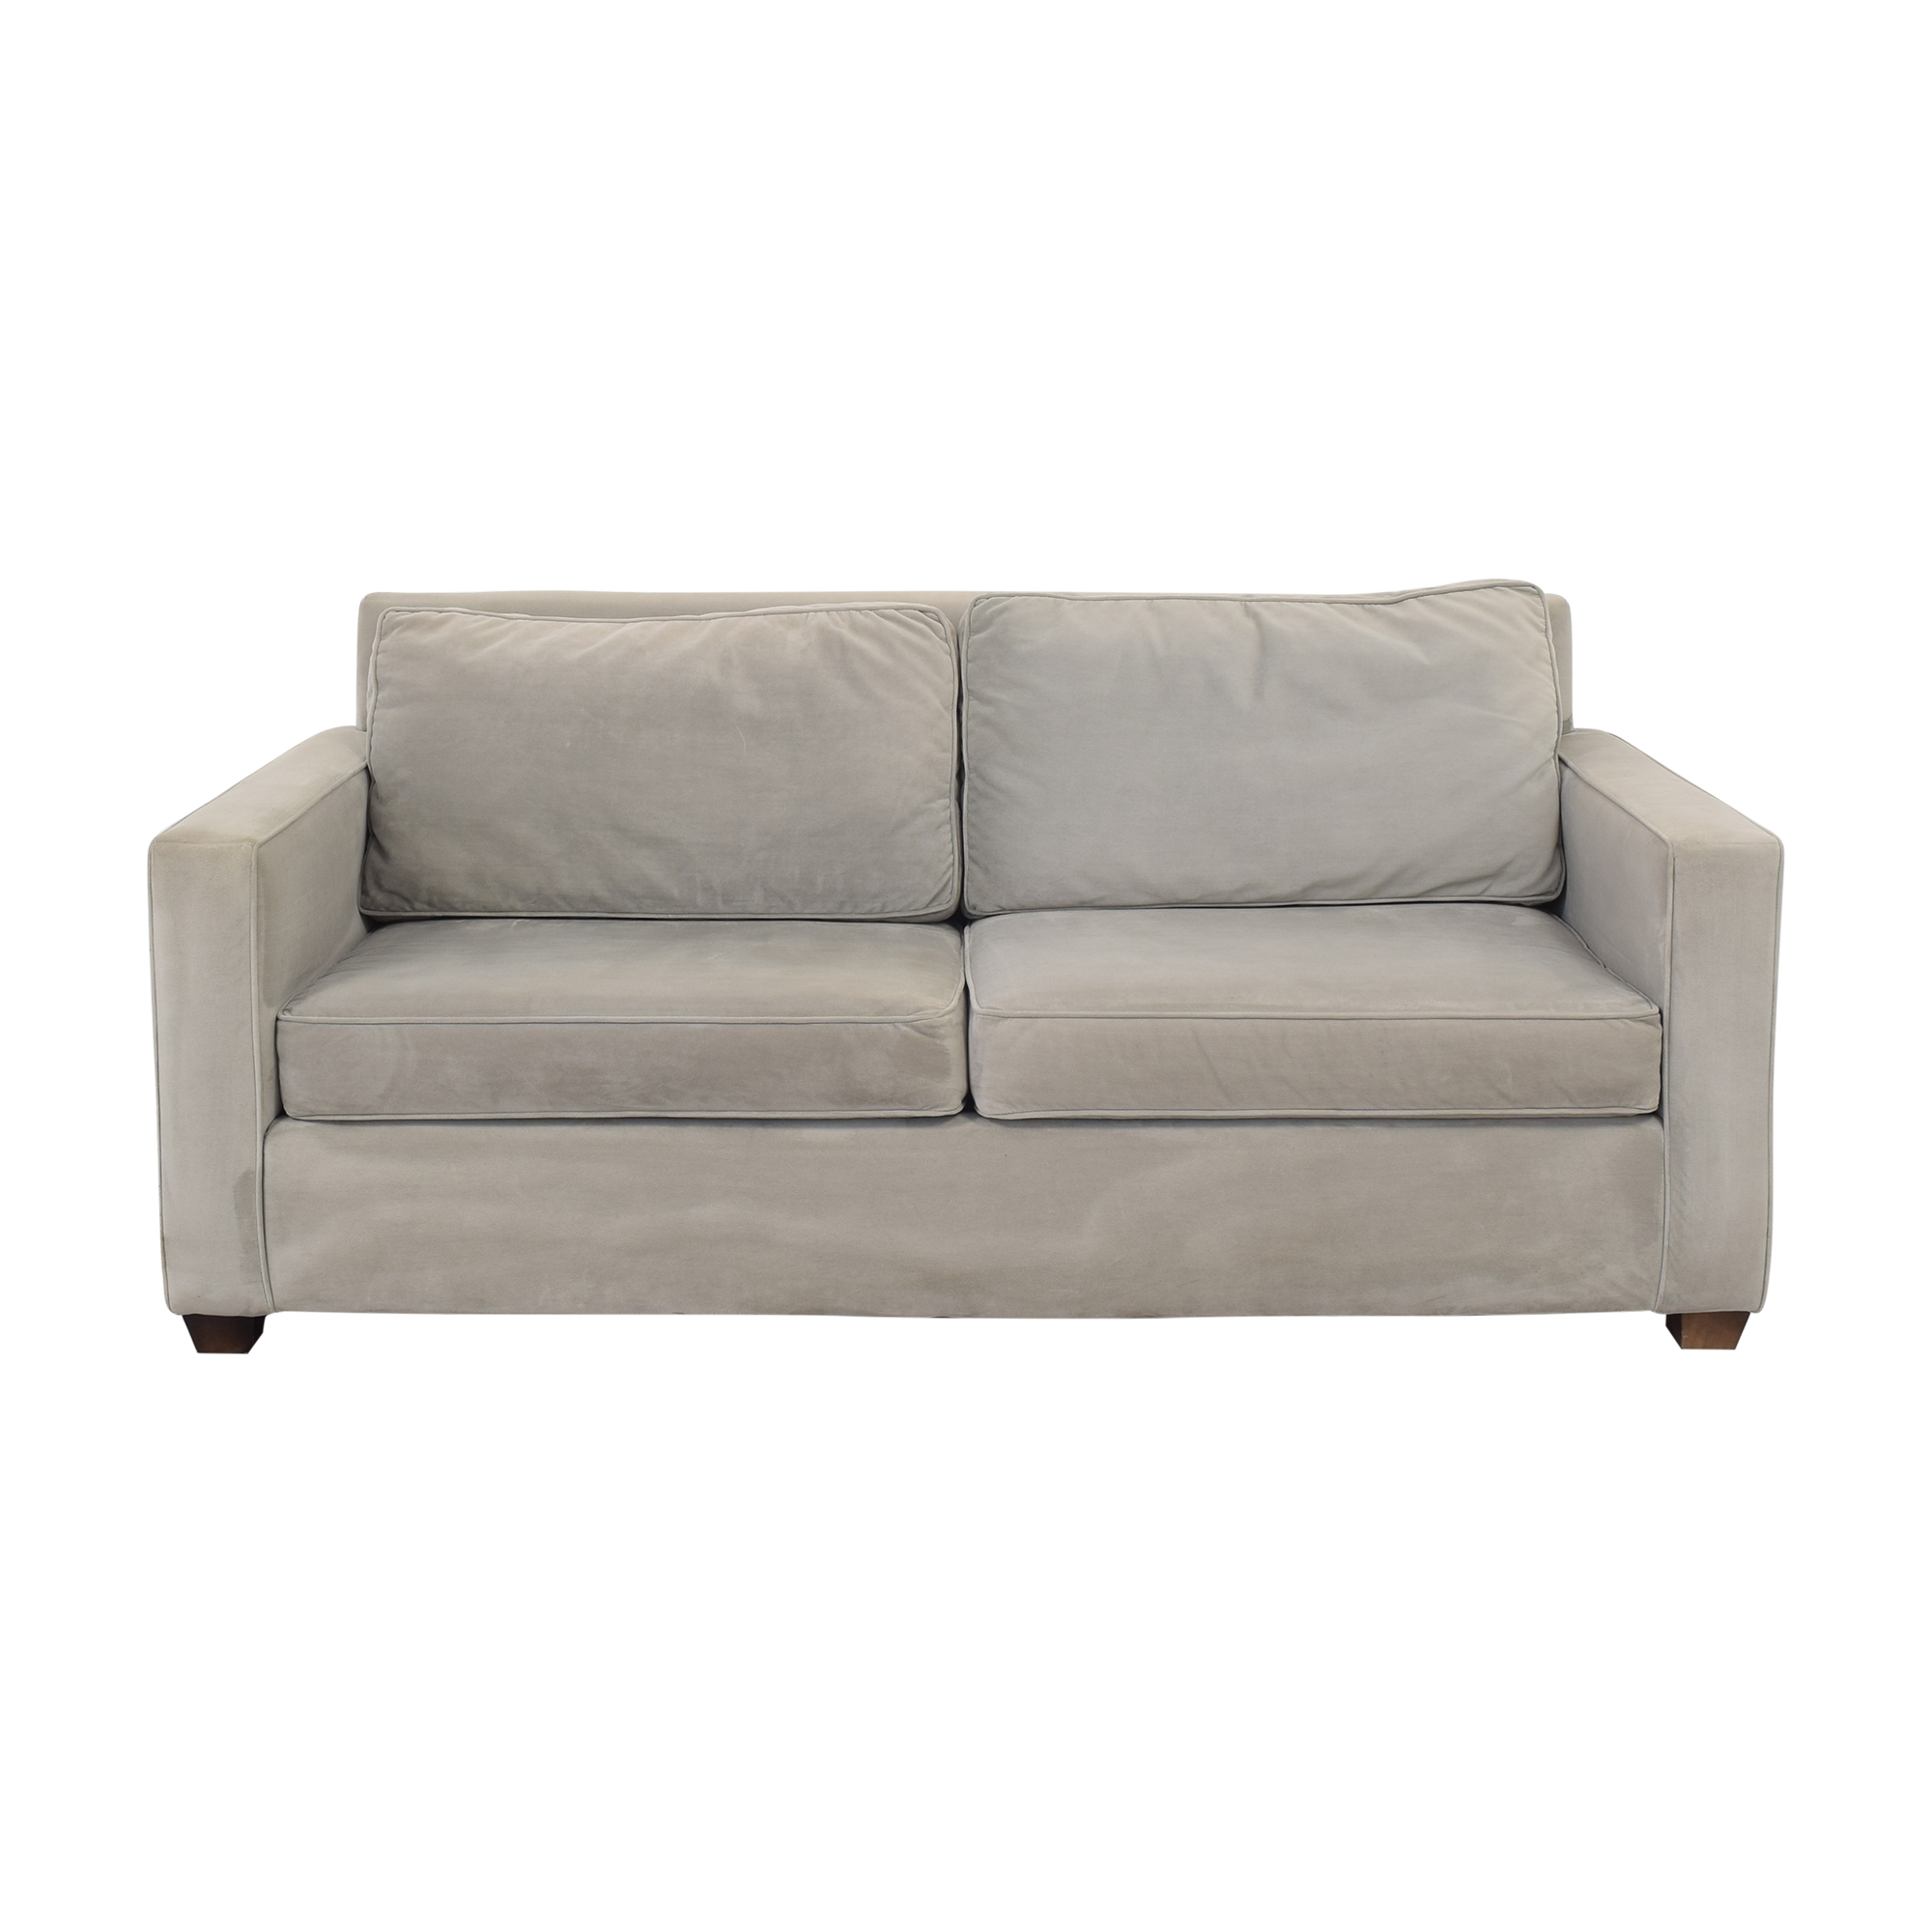 Williams Sonoma Williams Sonoma Two Cushion Sofa second hand